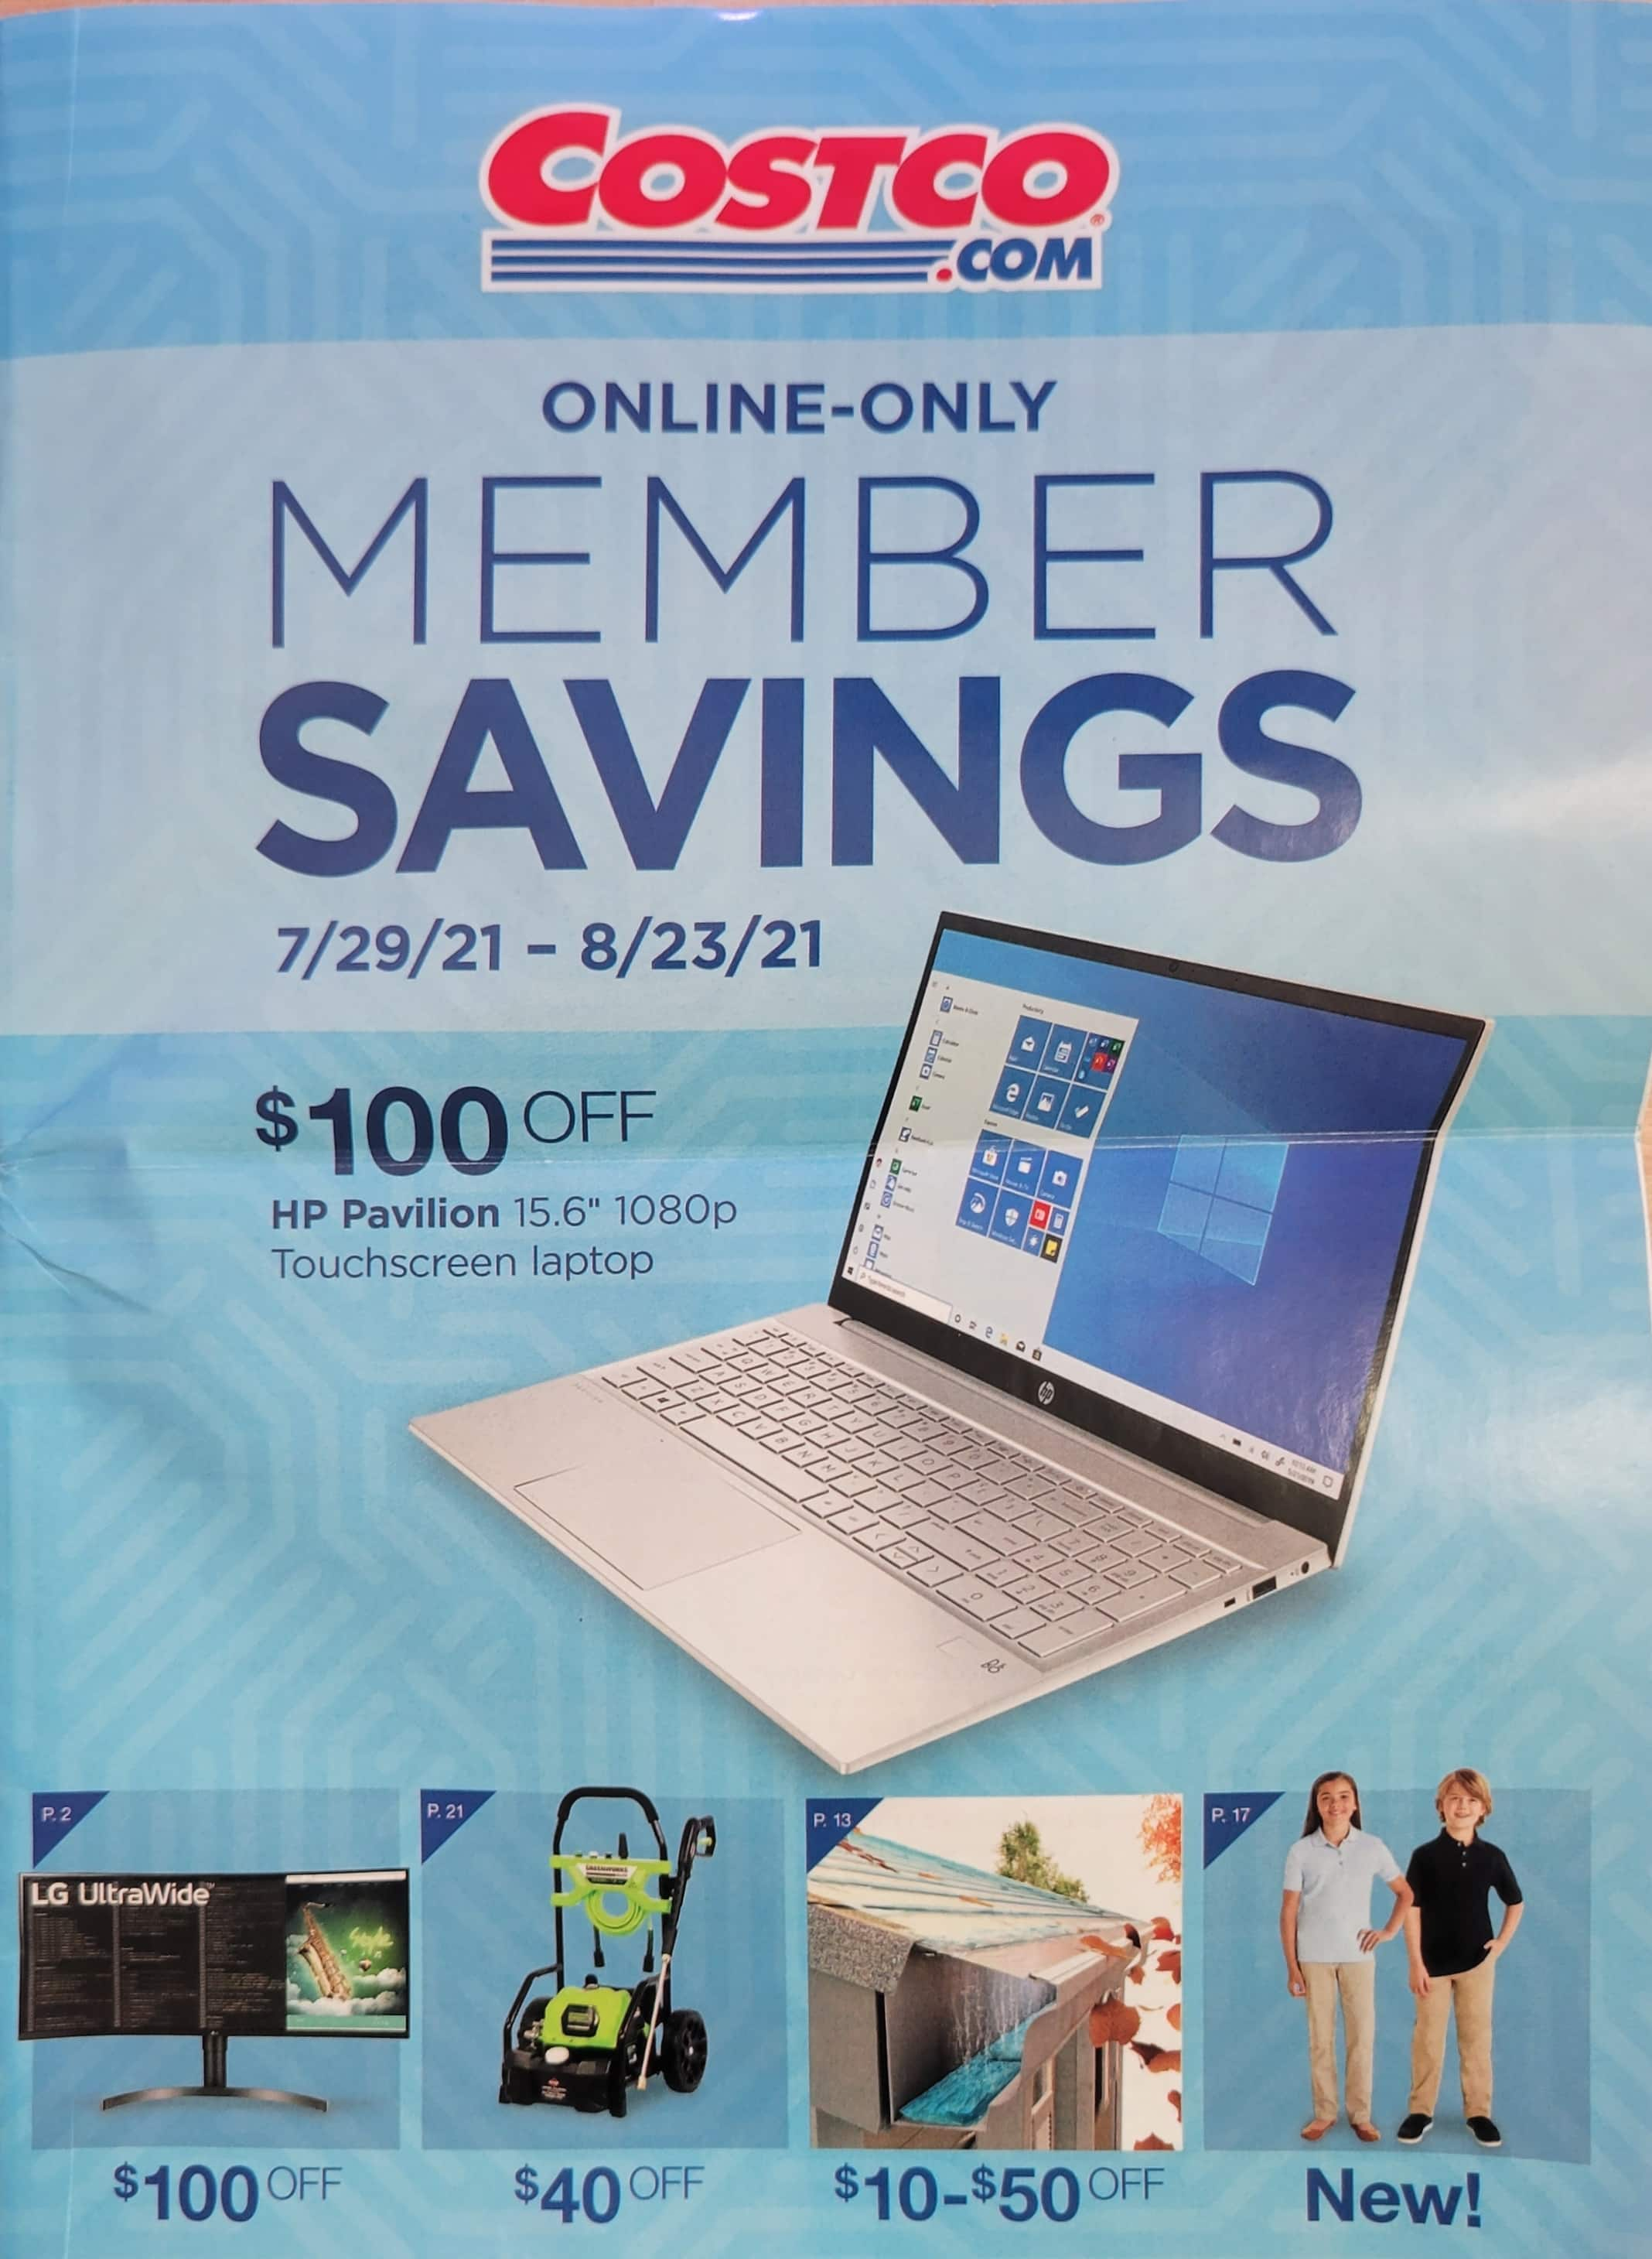 Costco Member Savings (Online Only) 07/29-08/23